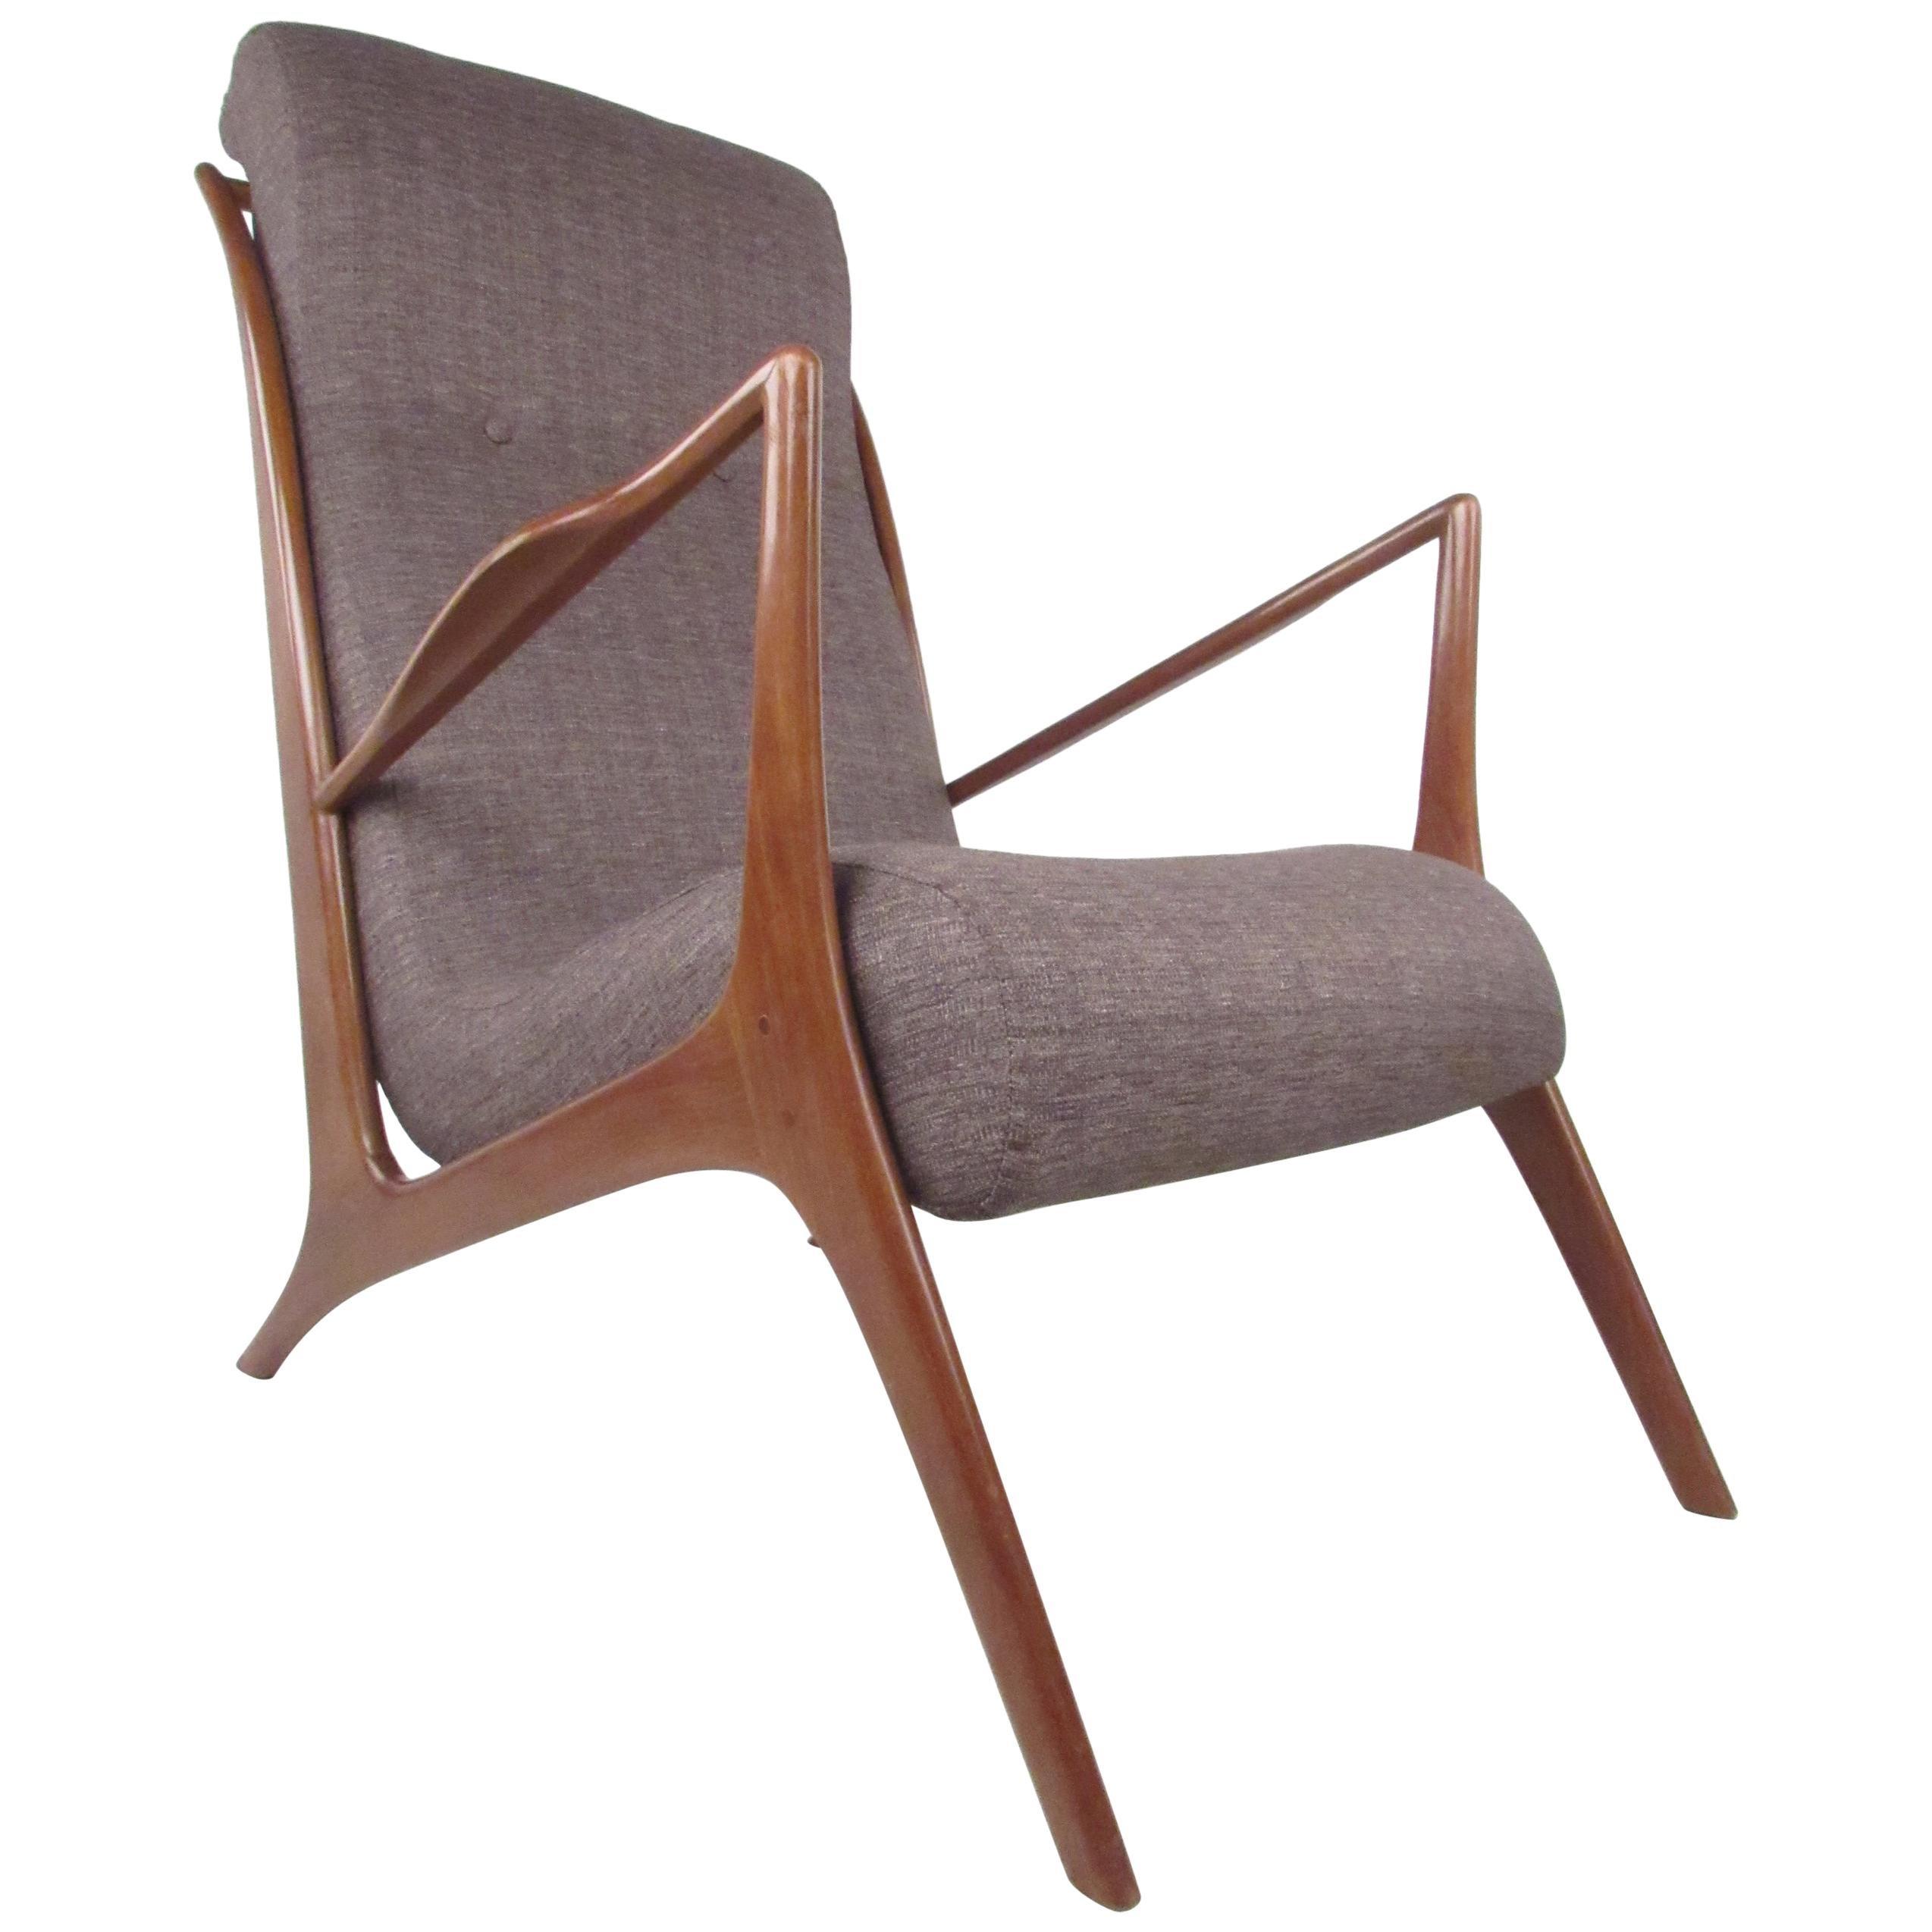 Unique Italian High Back Lounge Chair